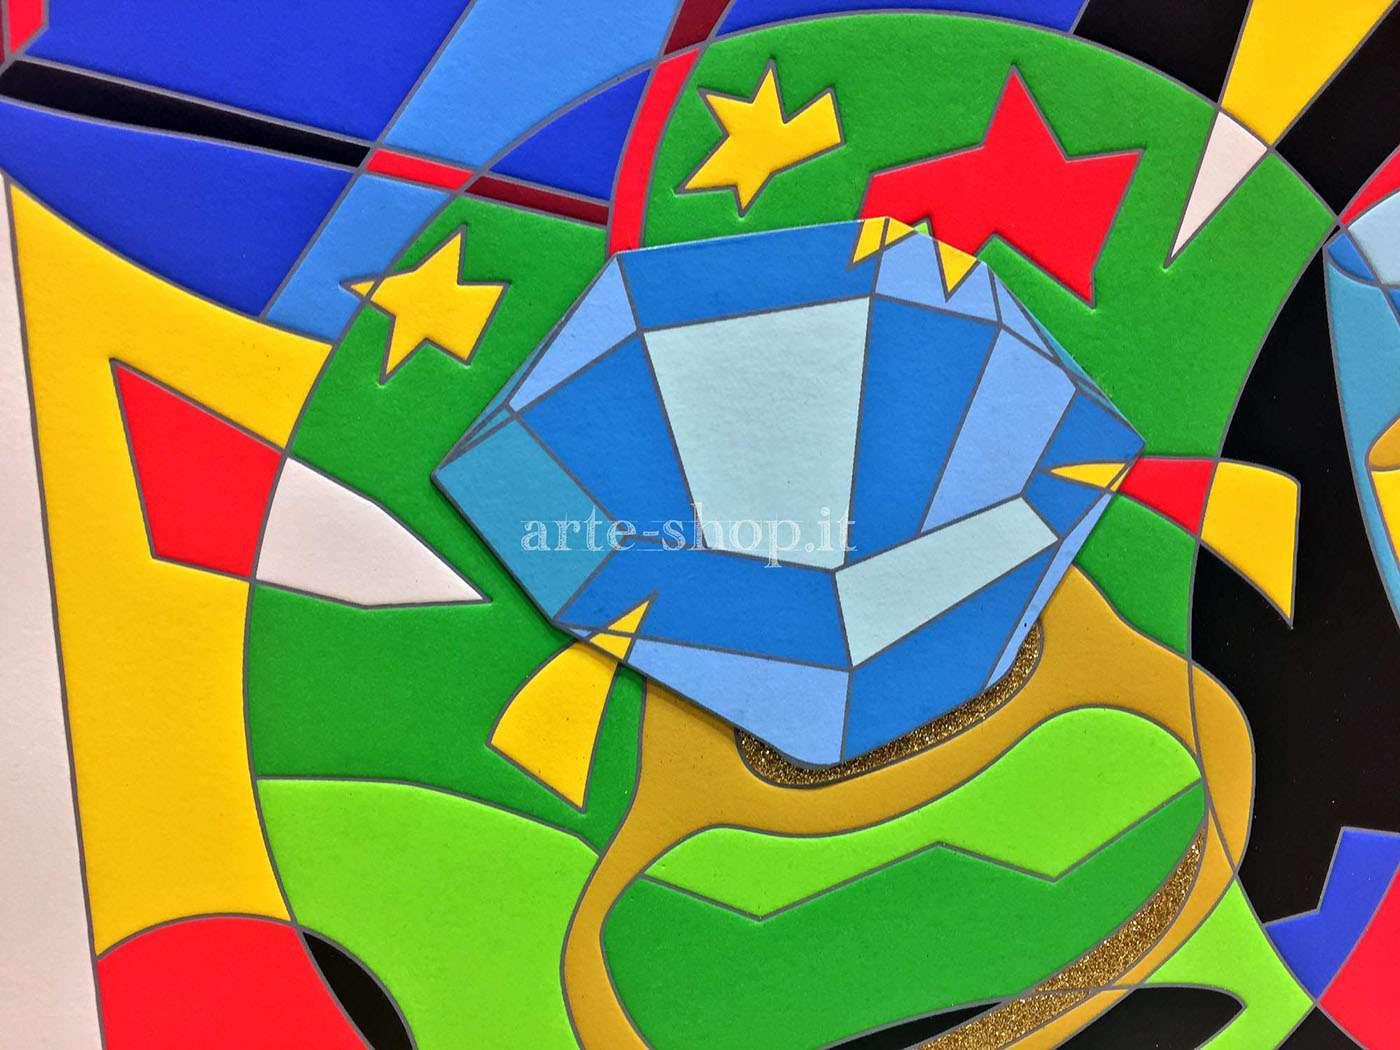 arte pentagono shop dettaglio numero 200